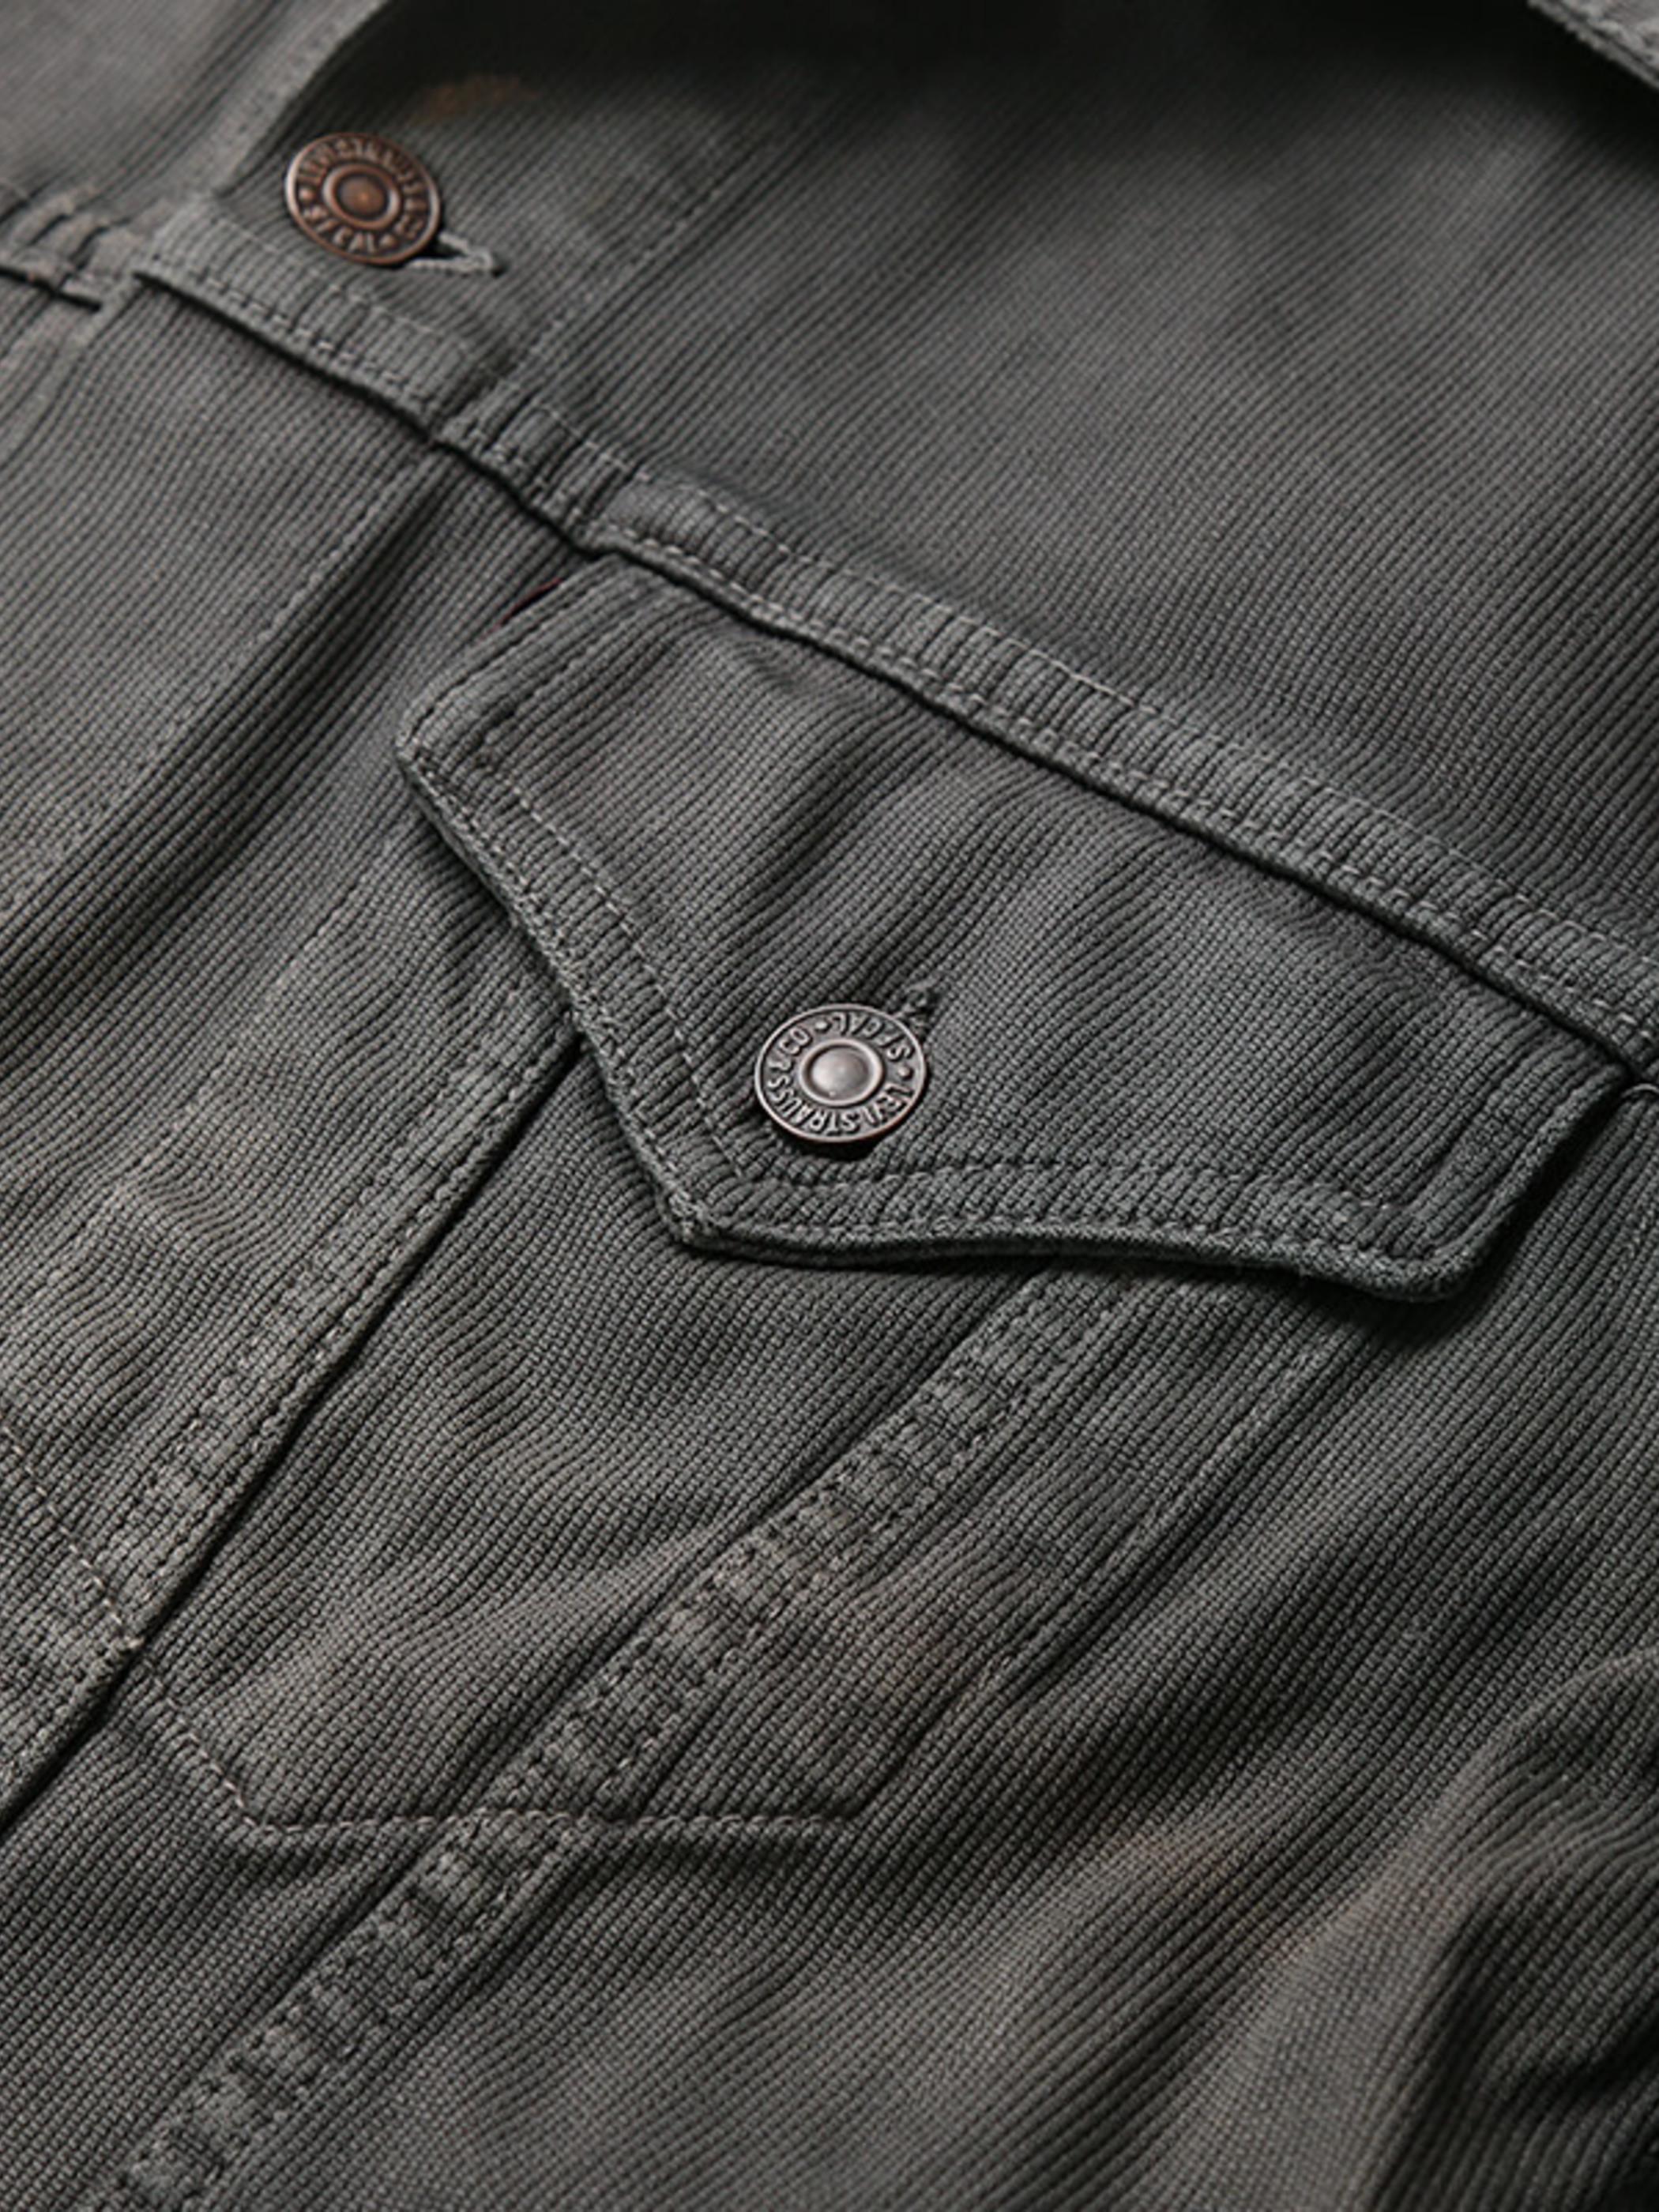 Used / Levi's / 1960's Vintage / 941B XX Cotton Pique Jacket / Over Dye Black